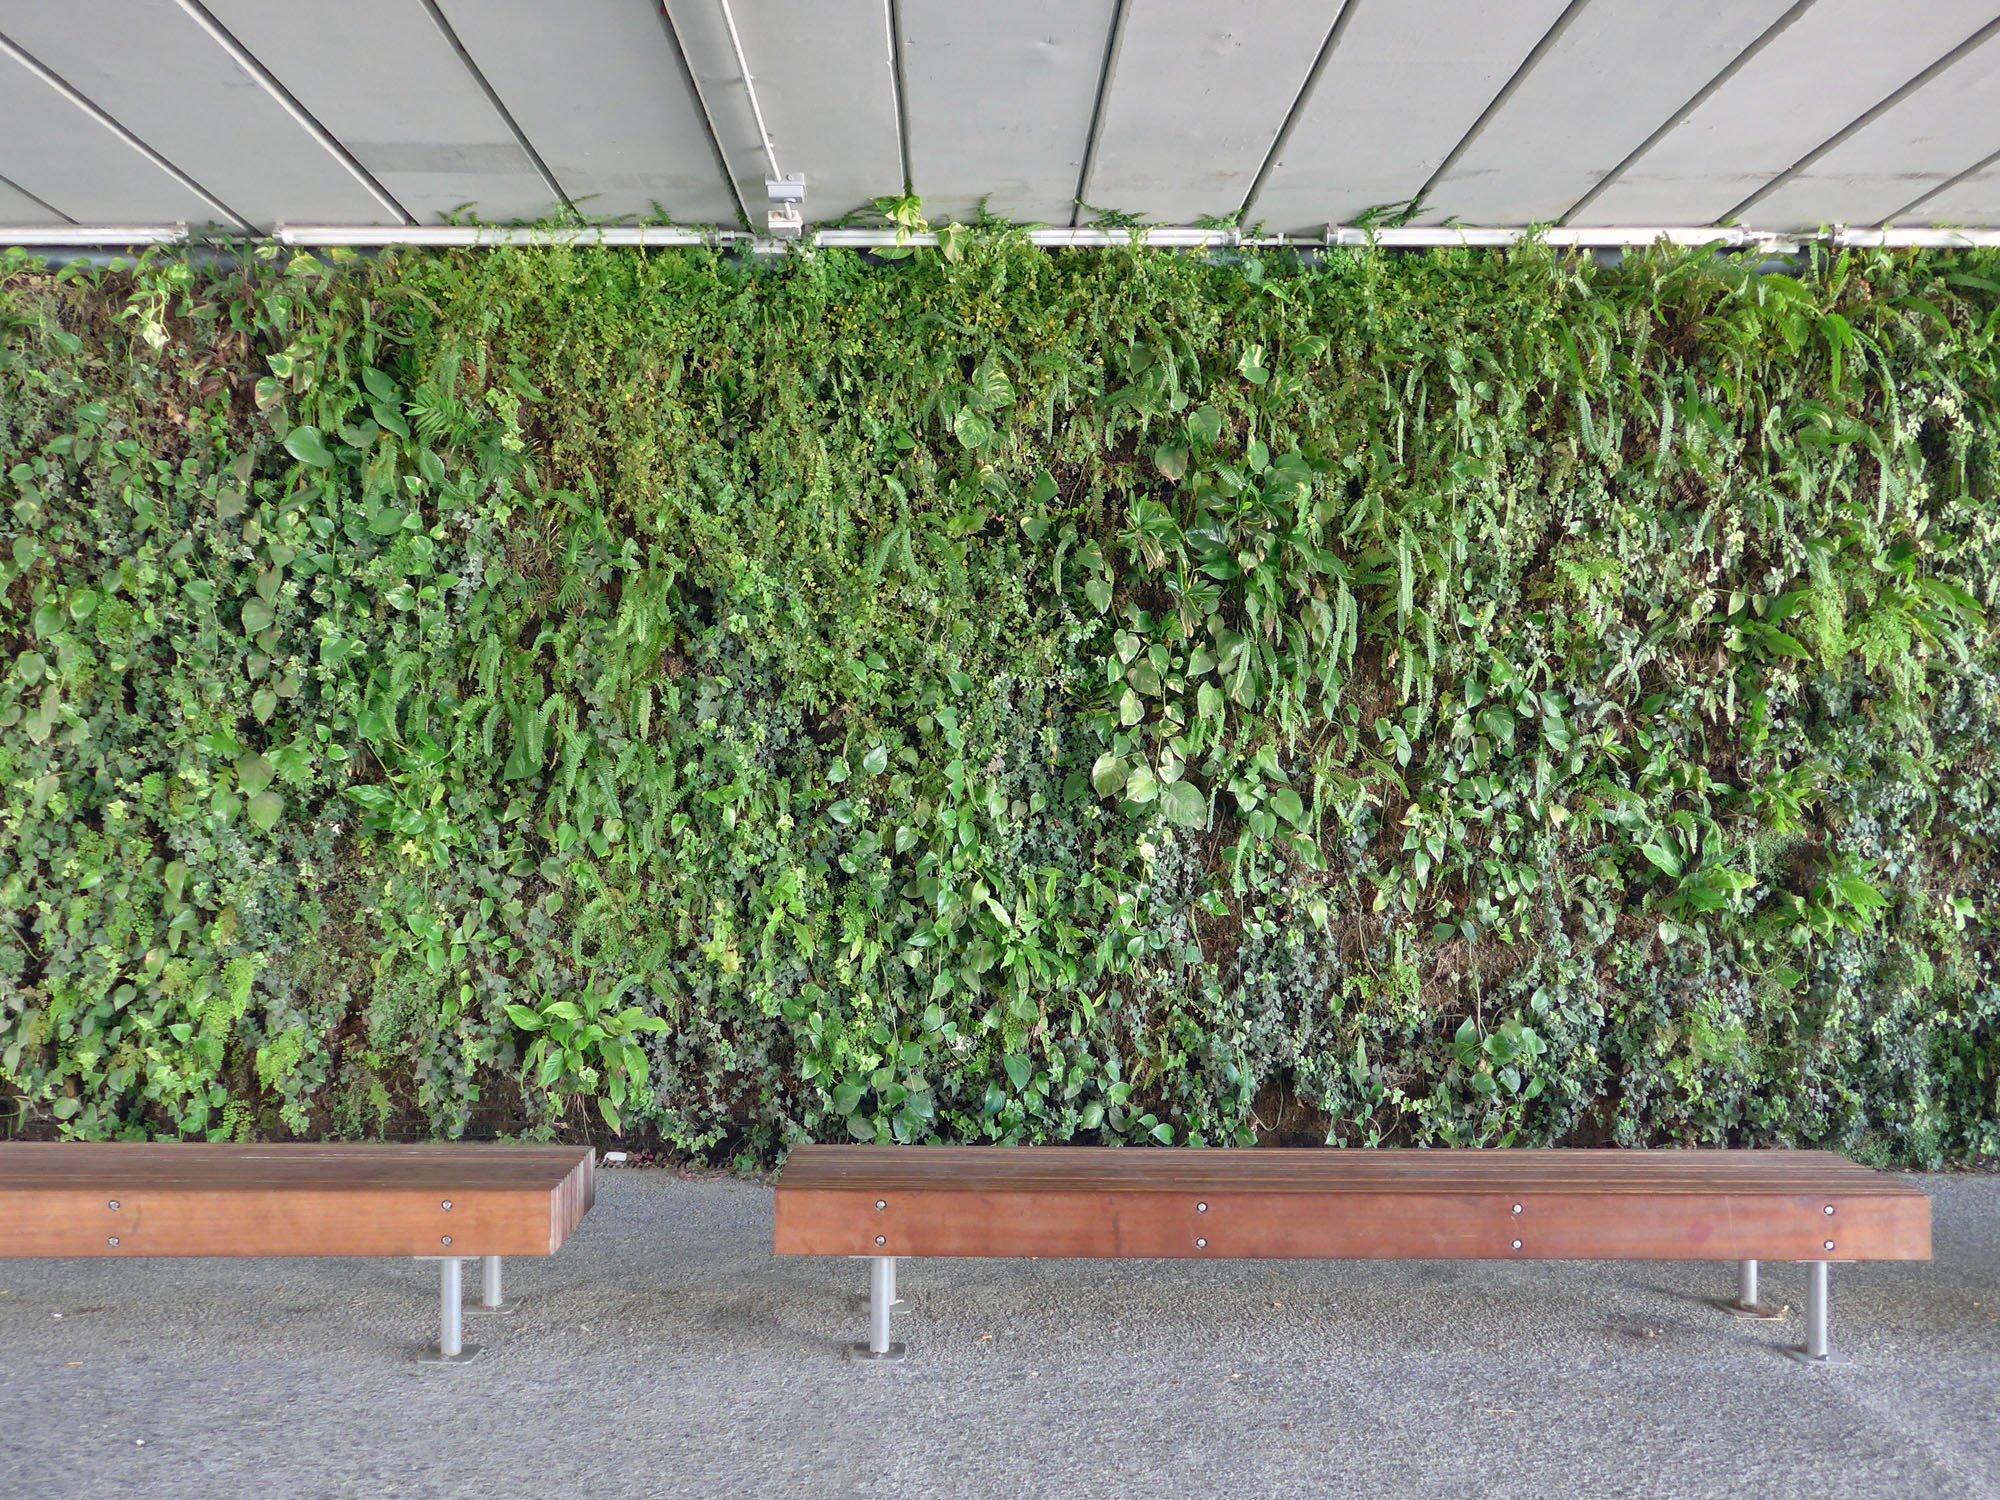 begrnte wand innen balkon ideen wand bepflanzen sitzbank holz sitzkissen with bepflanzte wand. Black Bedroom Furniture Sets. Home Design Ideas